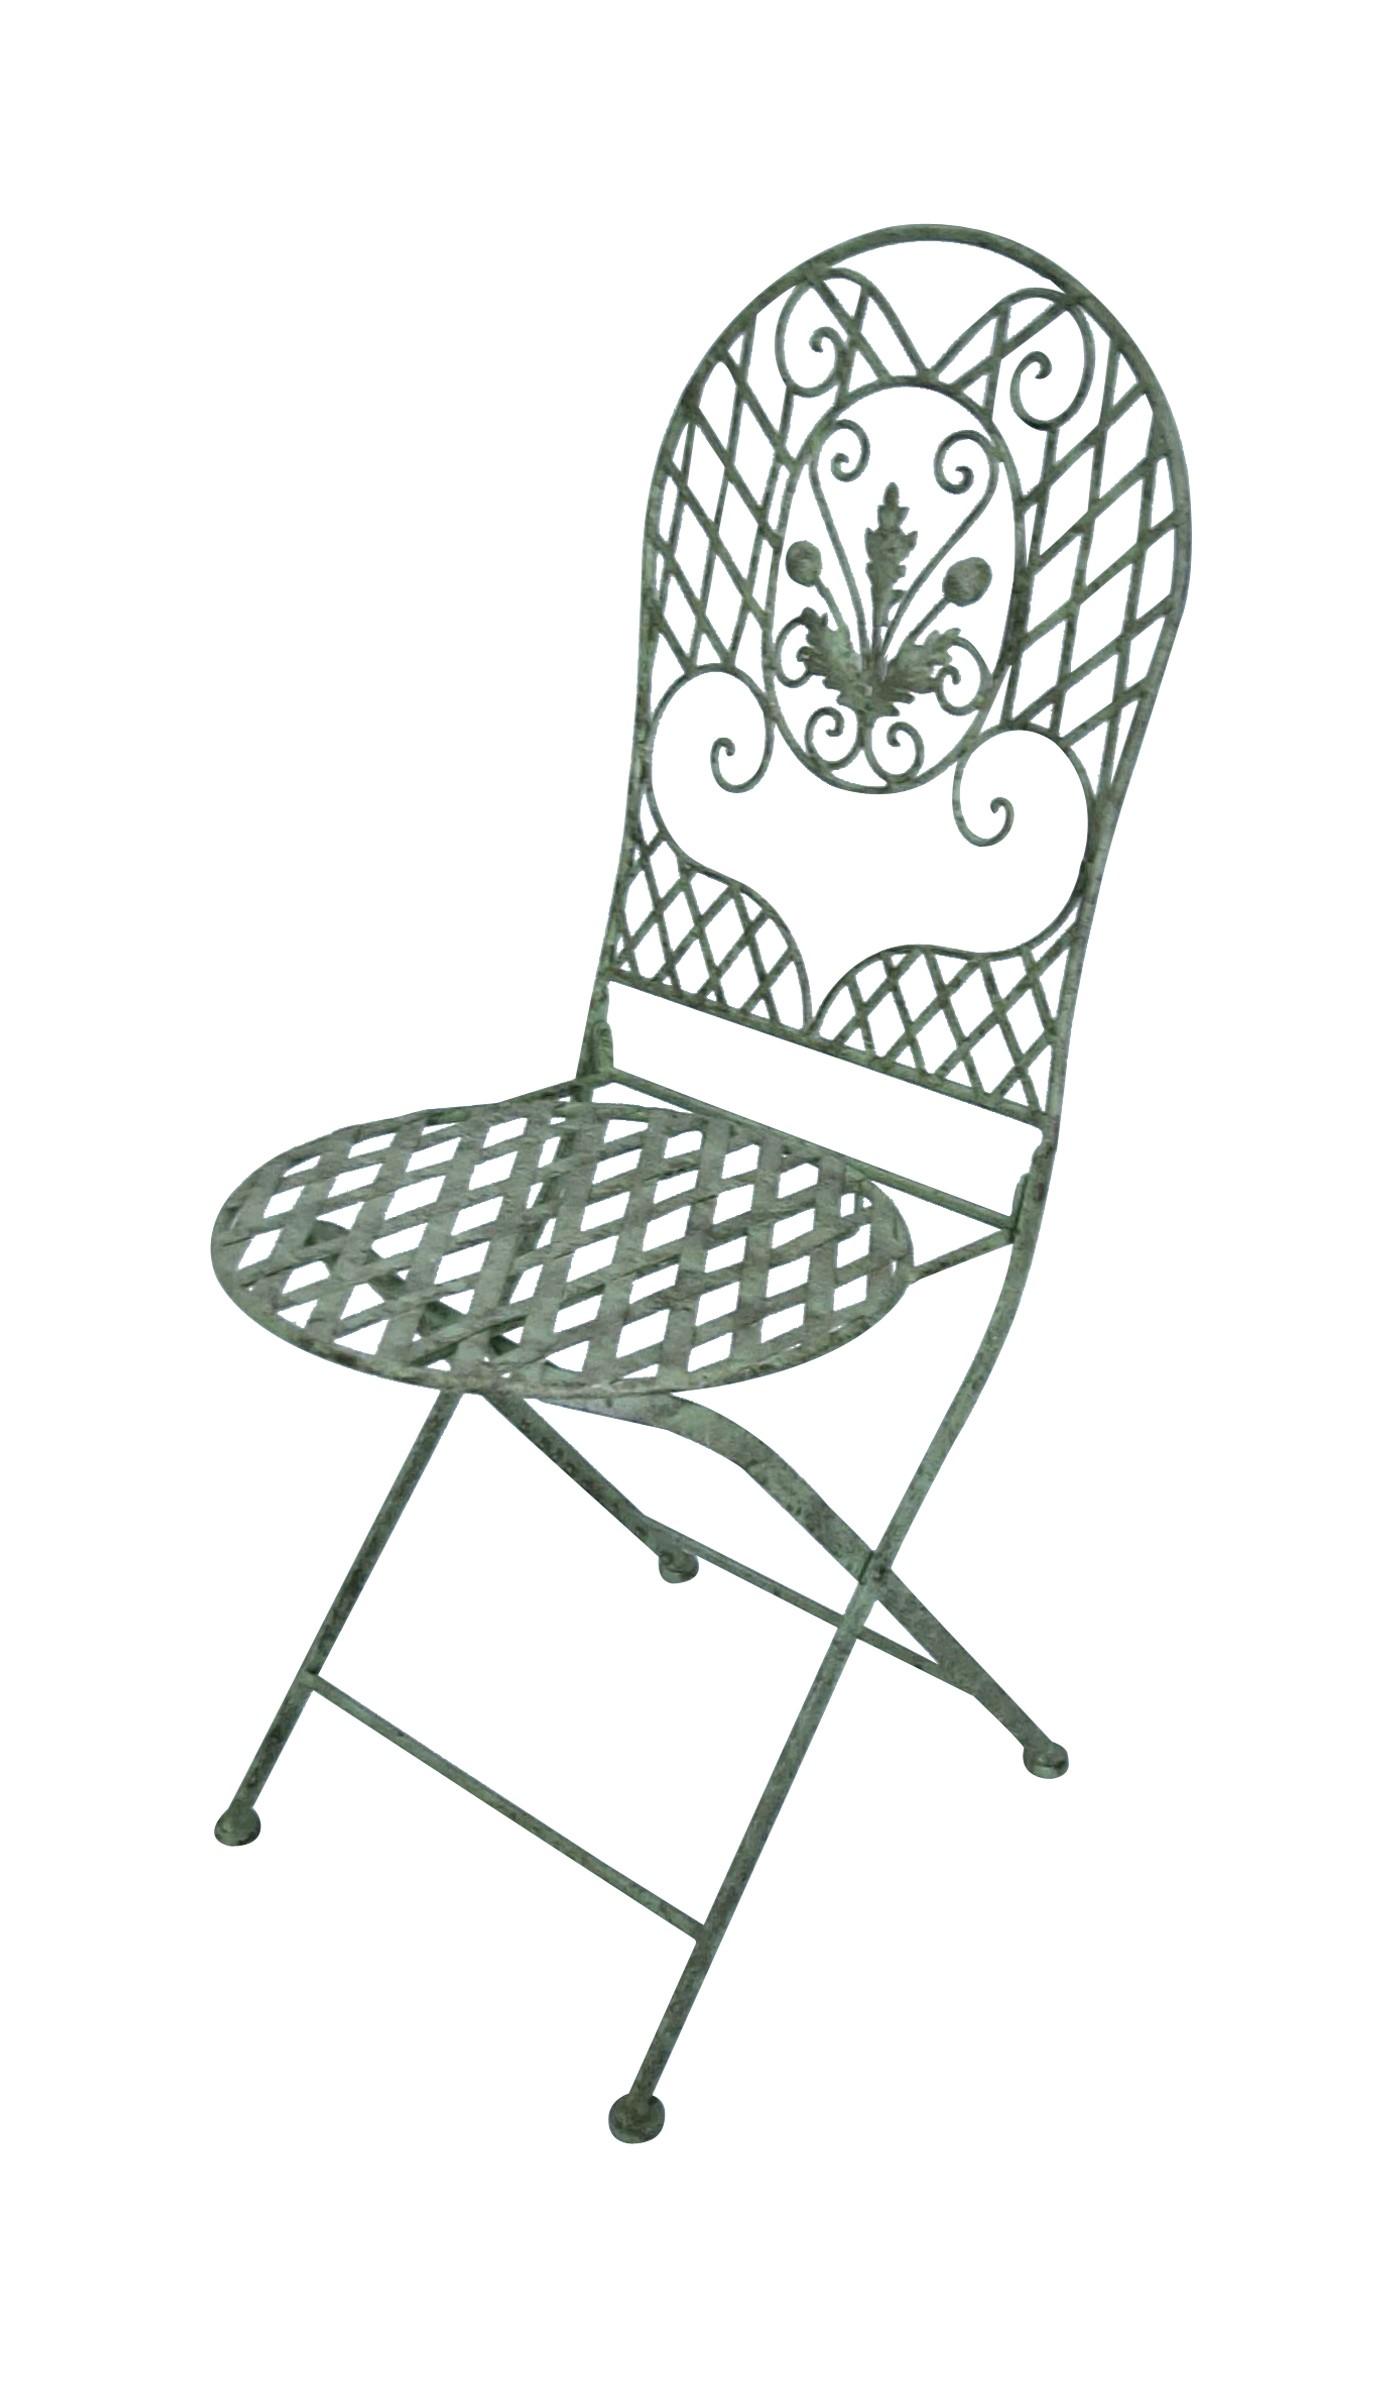 chaise en fer forg collection ch ne demeure et jardin. Black Bedroom Furniture Sets. Home Design Ideas